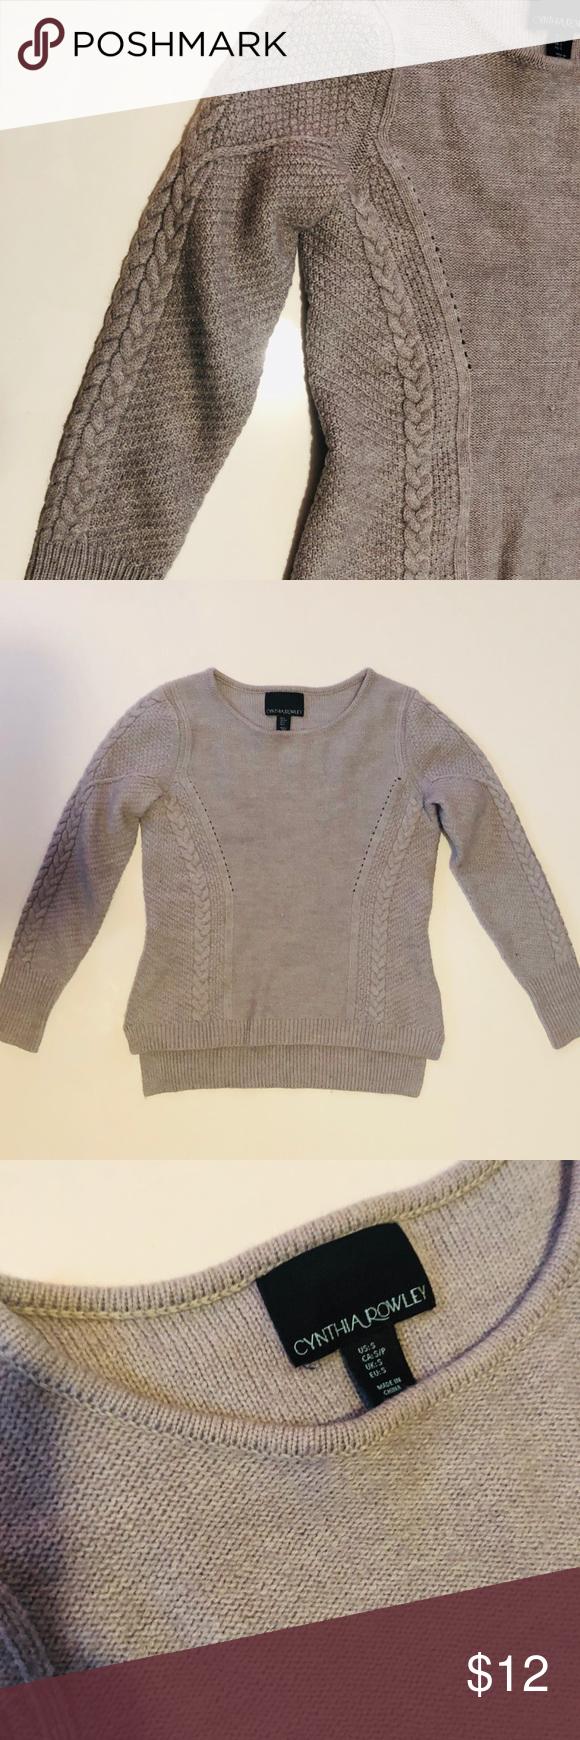 Cynthia Rowley Grey Sweater | Sweaters, Grey sweater